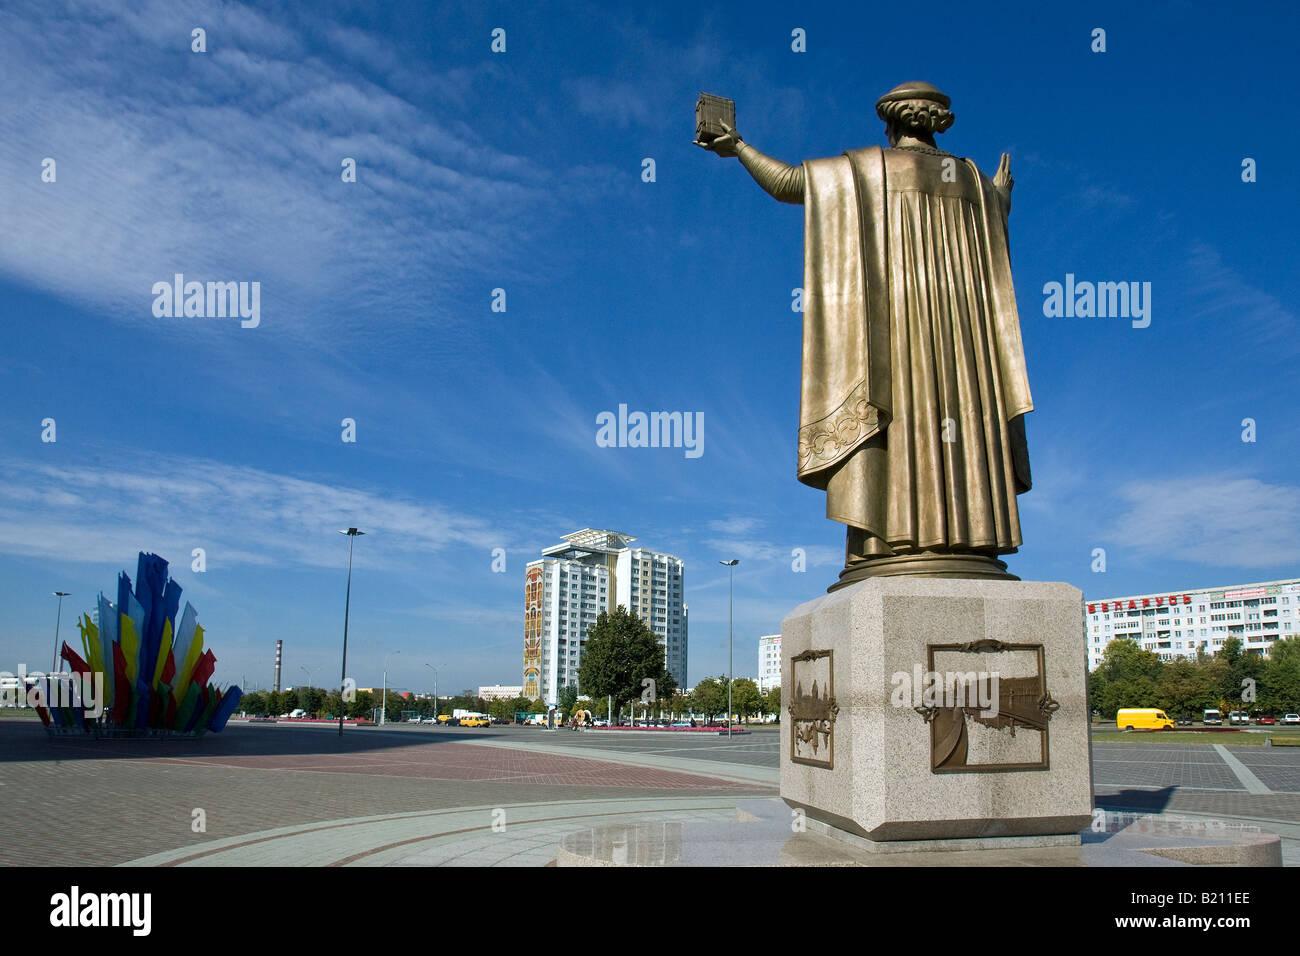 A statue of the scholar Frantsysk Skaryna in Minsk, capital of Belarus. - Stock Image